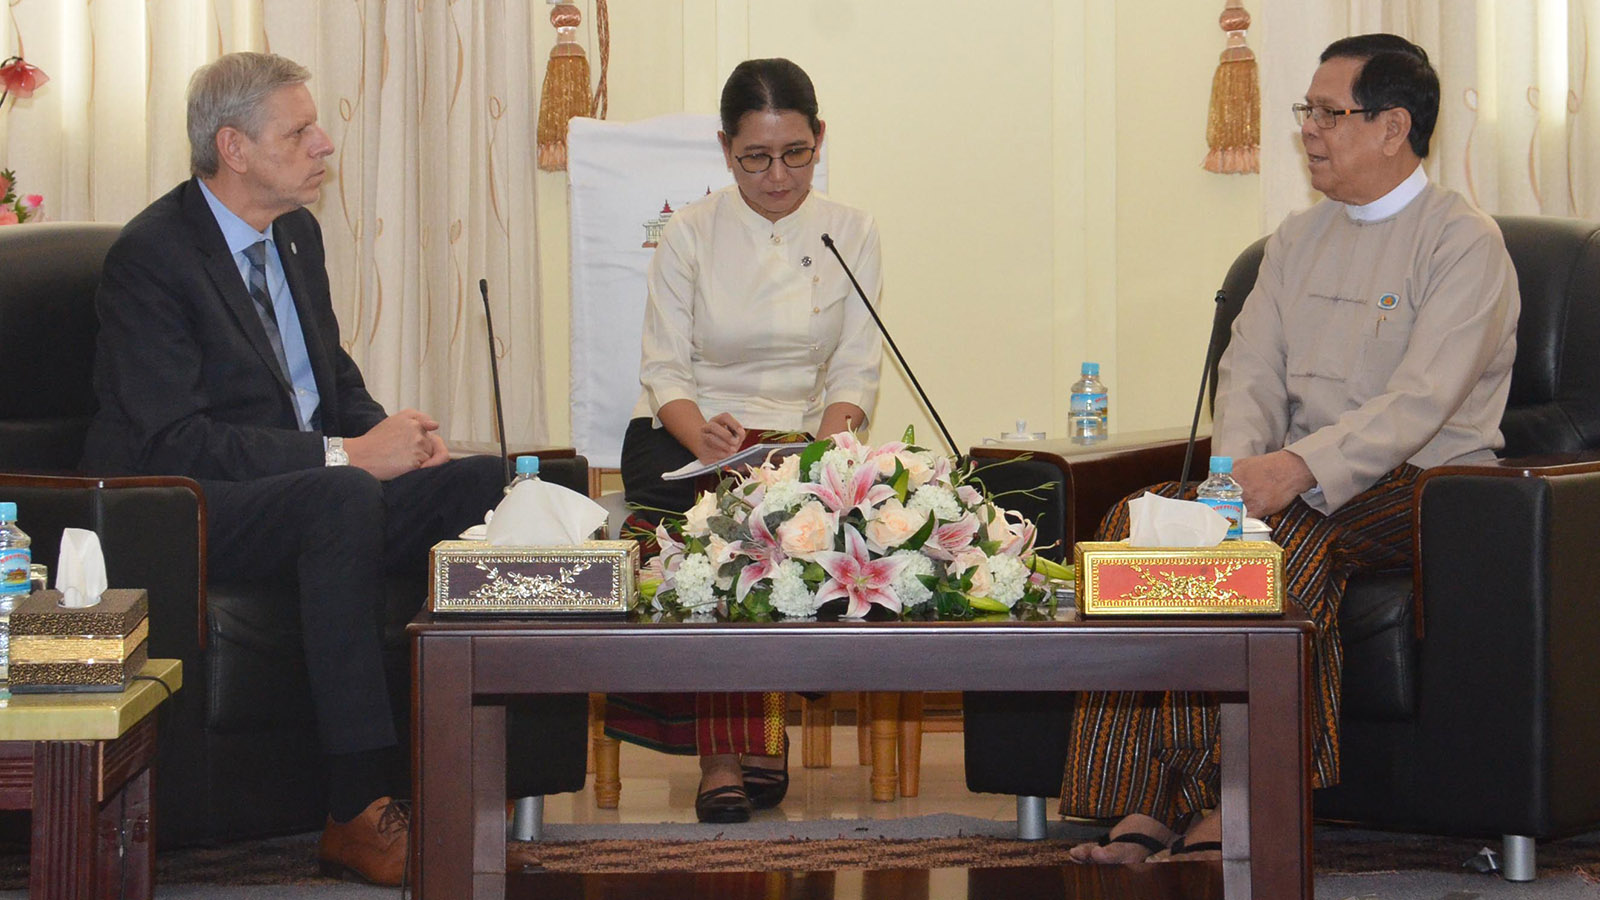 Amyotha Hluttaw Deputy Speaker U Aye Tha Aung meets with Mr Jan Hornik, Vice President of the Czech Republic's Senate, in Nay Pyi Taw yesterday.Photo: MNA